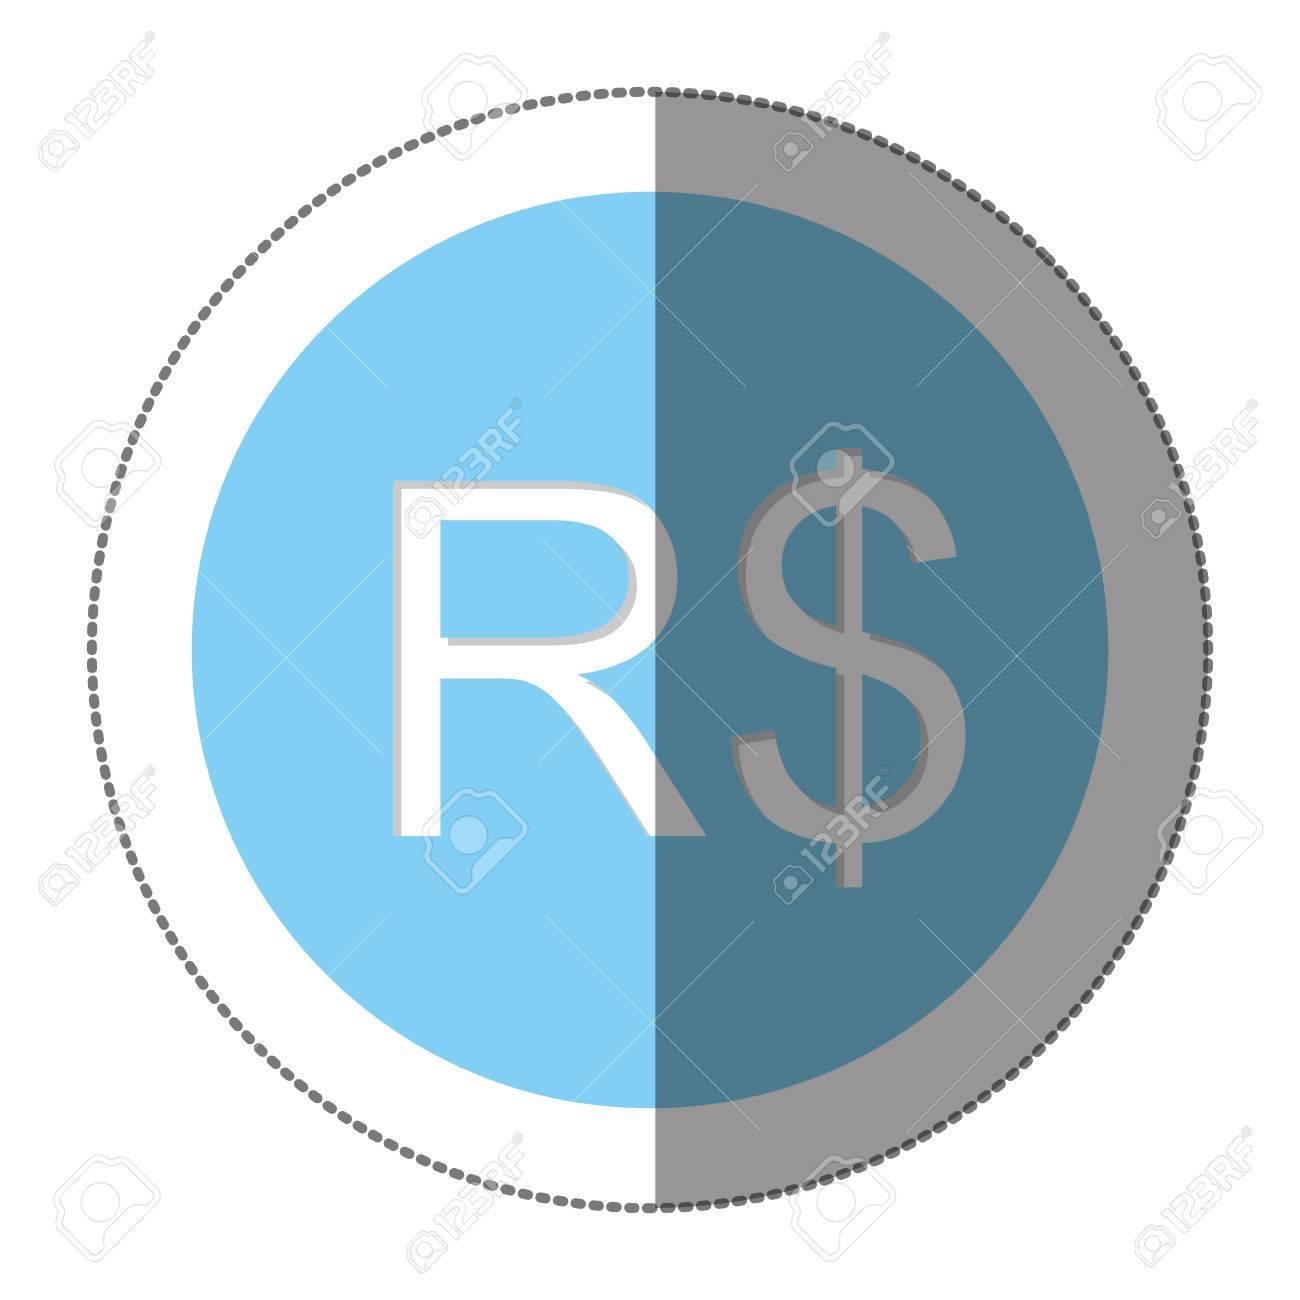 Ascii code for rupee symbol gallery symbol and sign ideas fish symbol keyboard gallery symbol and sign ideas currency symbols rs choice image symbol design logo biocorpaavc